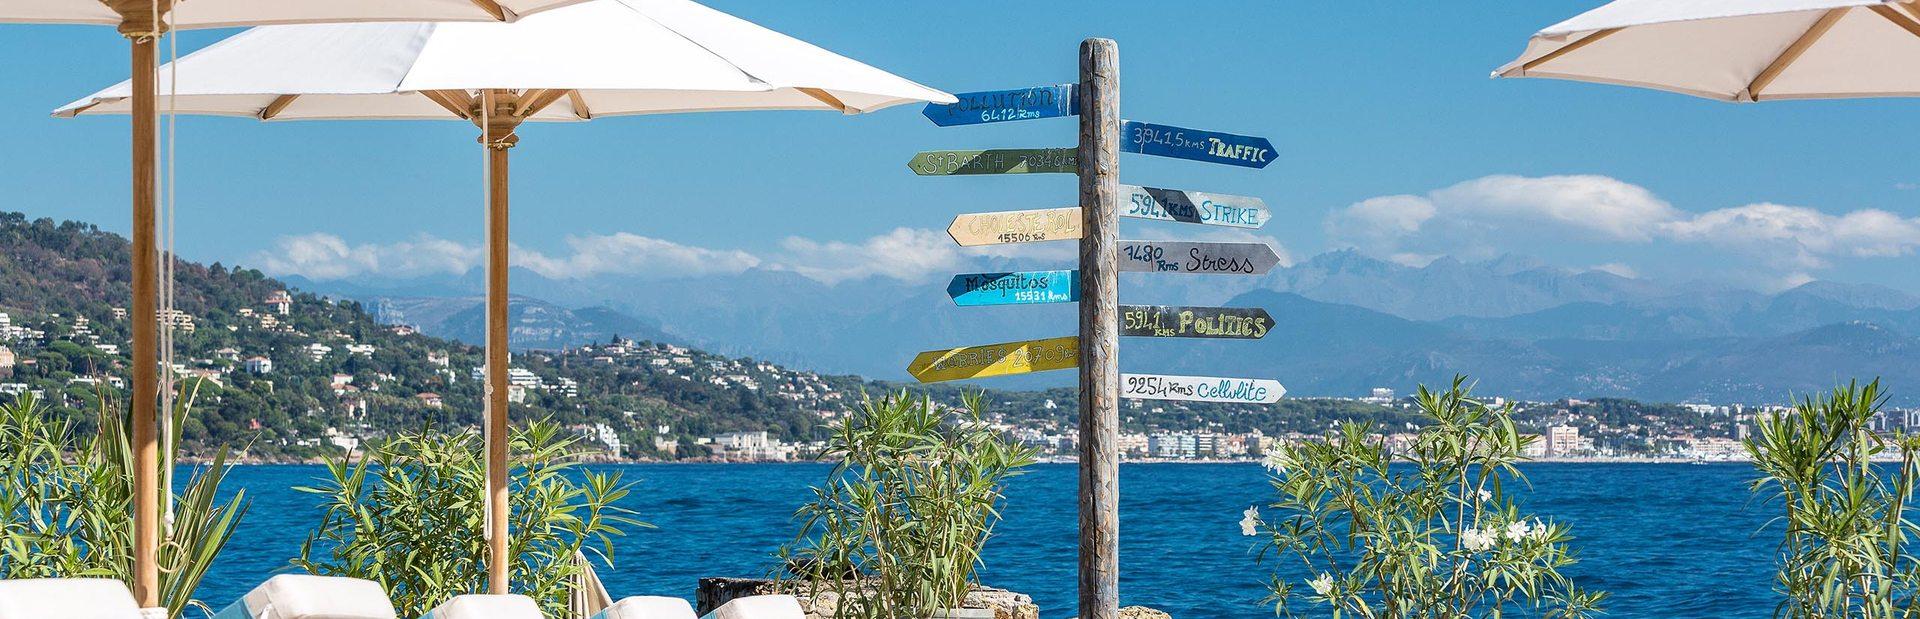 La Guérite | Cannes Image 1